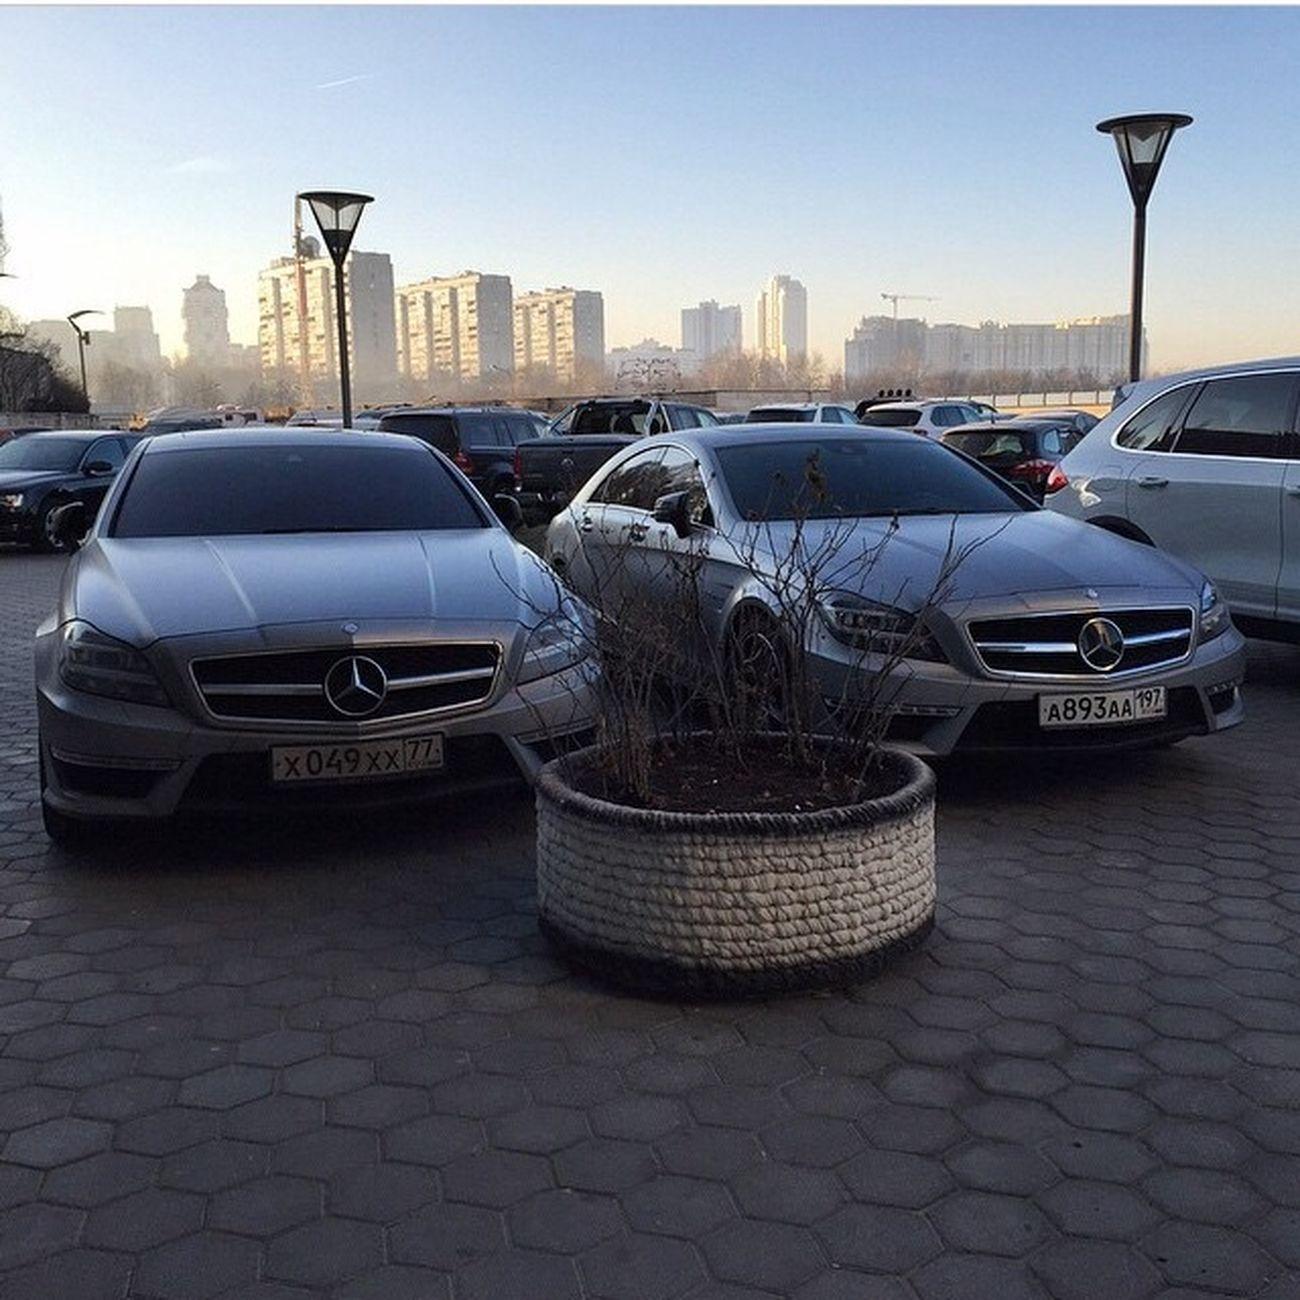 Wheels #колеса #Smotra #Смотра #Москва #Россия #Moscow #Russia #vsco #vscocam #vscocars #cars #car #girl #girls #drive2 драйв2 Magicalgarage AMG Mercedes Car Cars Dubai London Moscow Moscow City Smotra